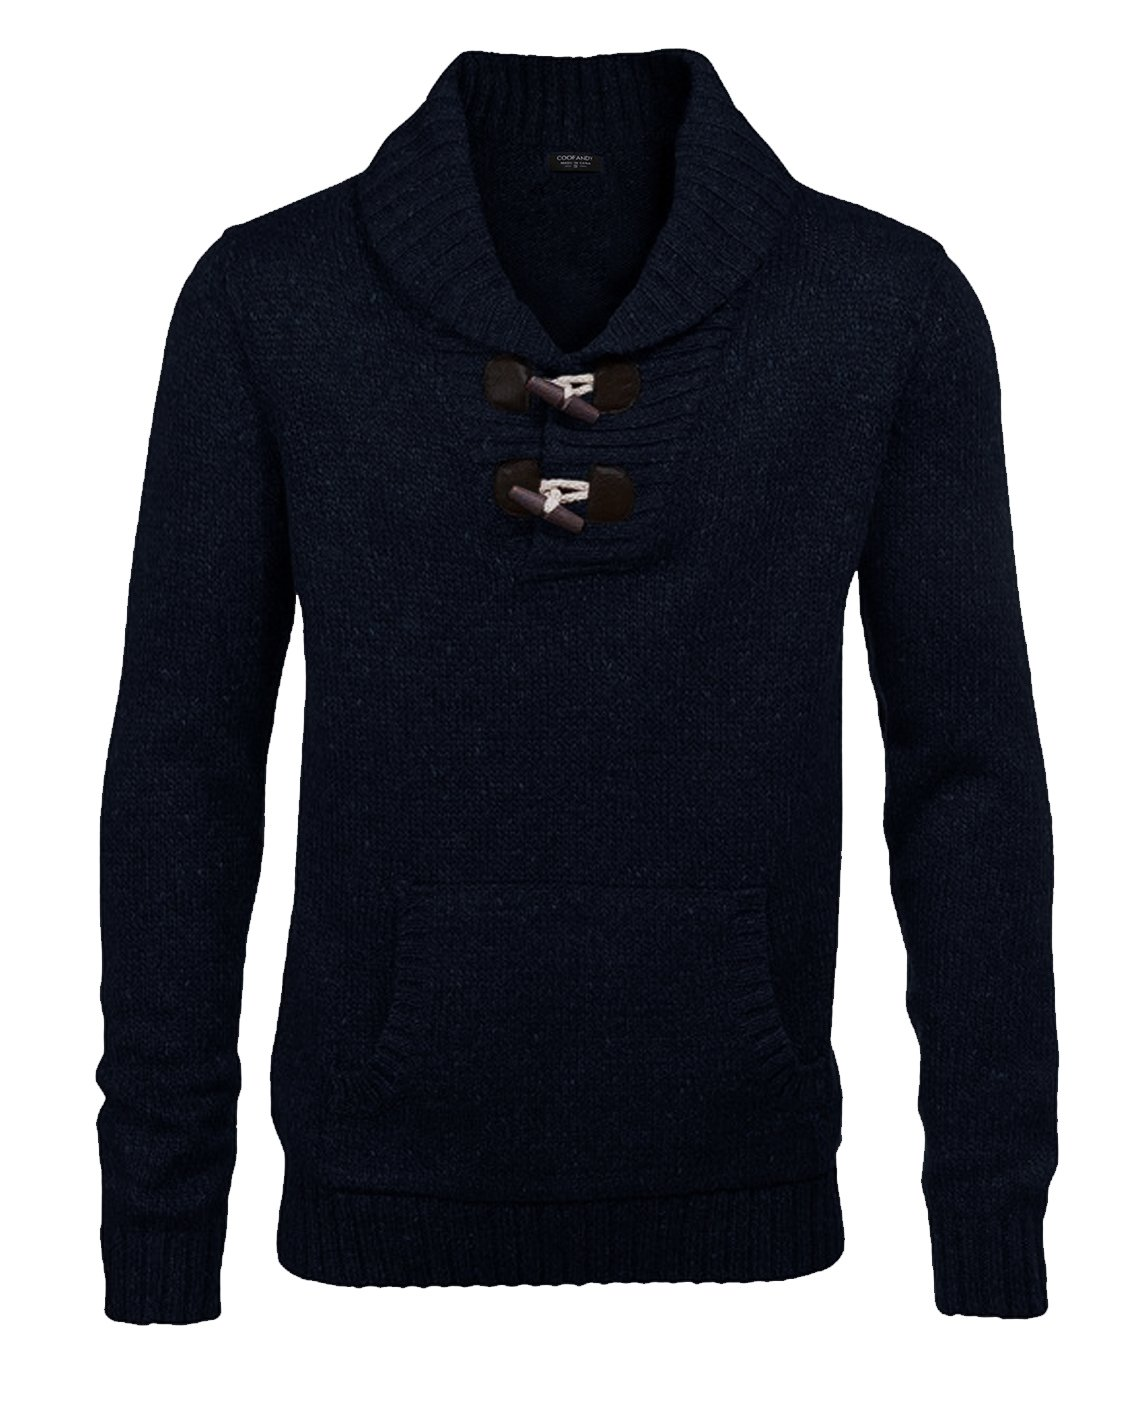 Coofandy Men's Knitted Slim Fit Shawl Collar Sweater Long Sleeve Pullover Black Medium